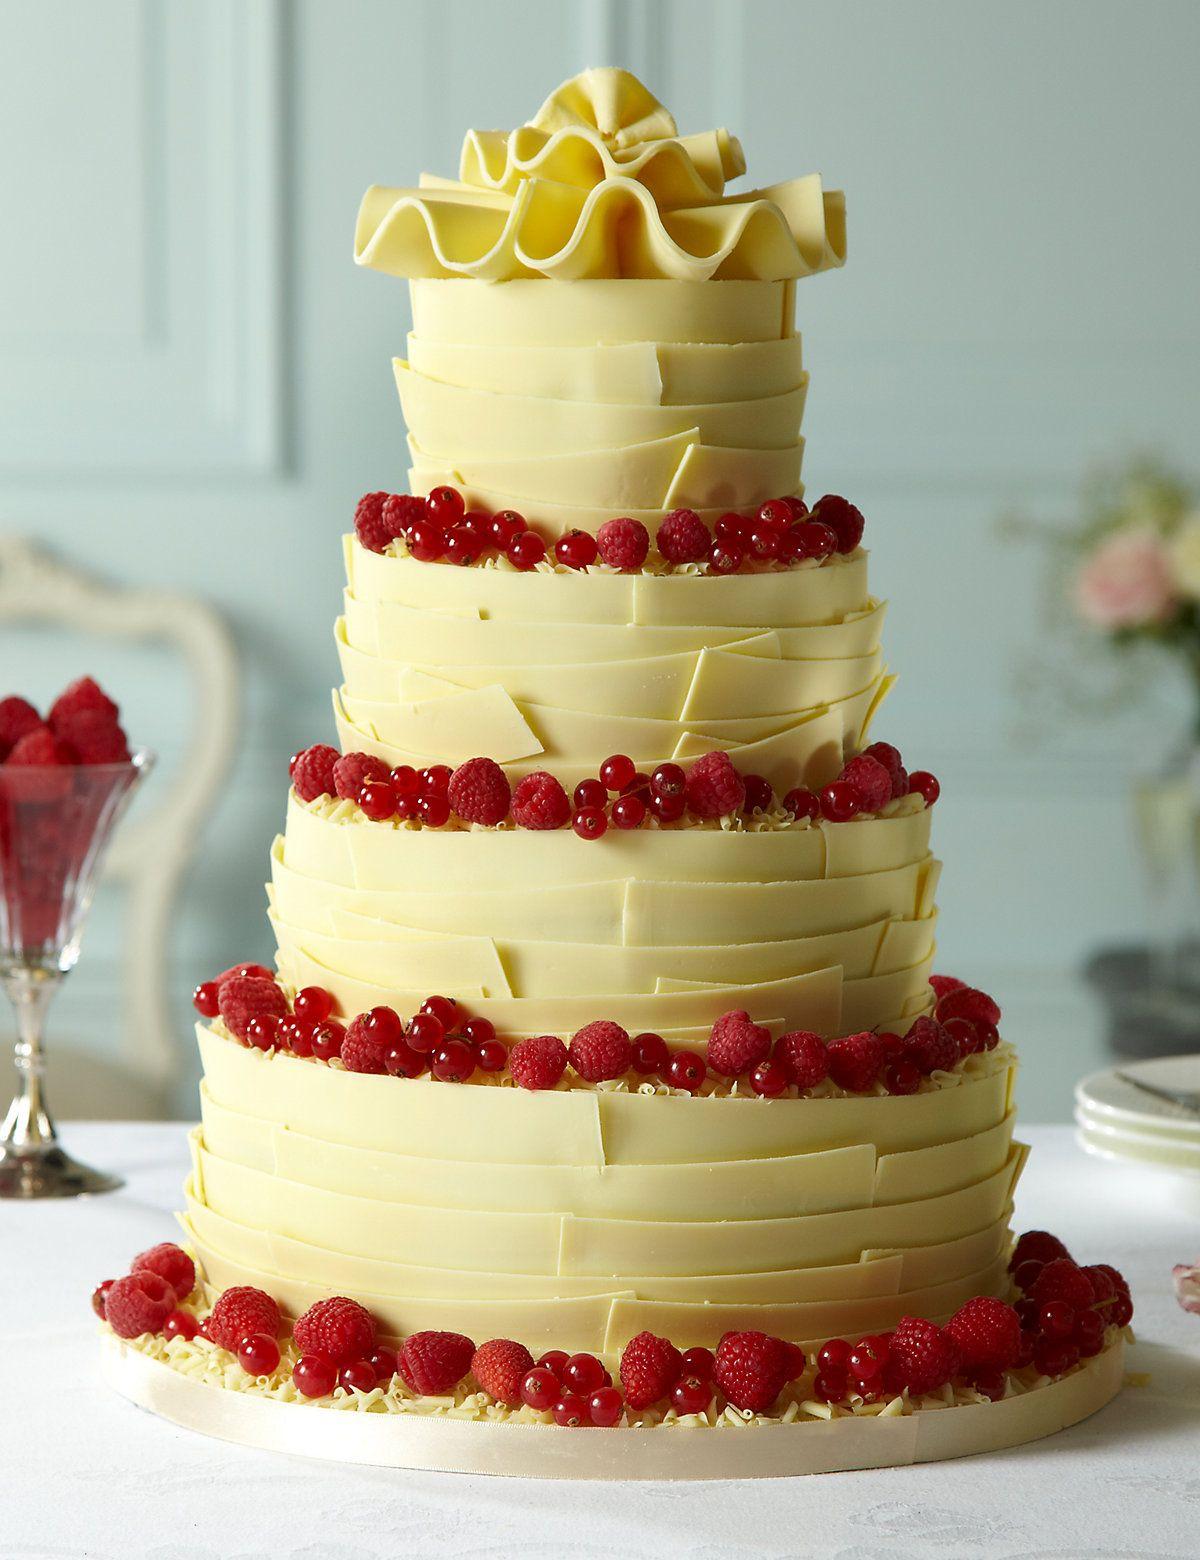 White Chocolate Ribbons Wedding Cake | My \